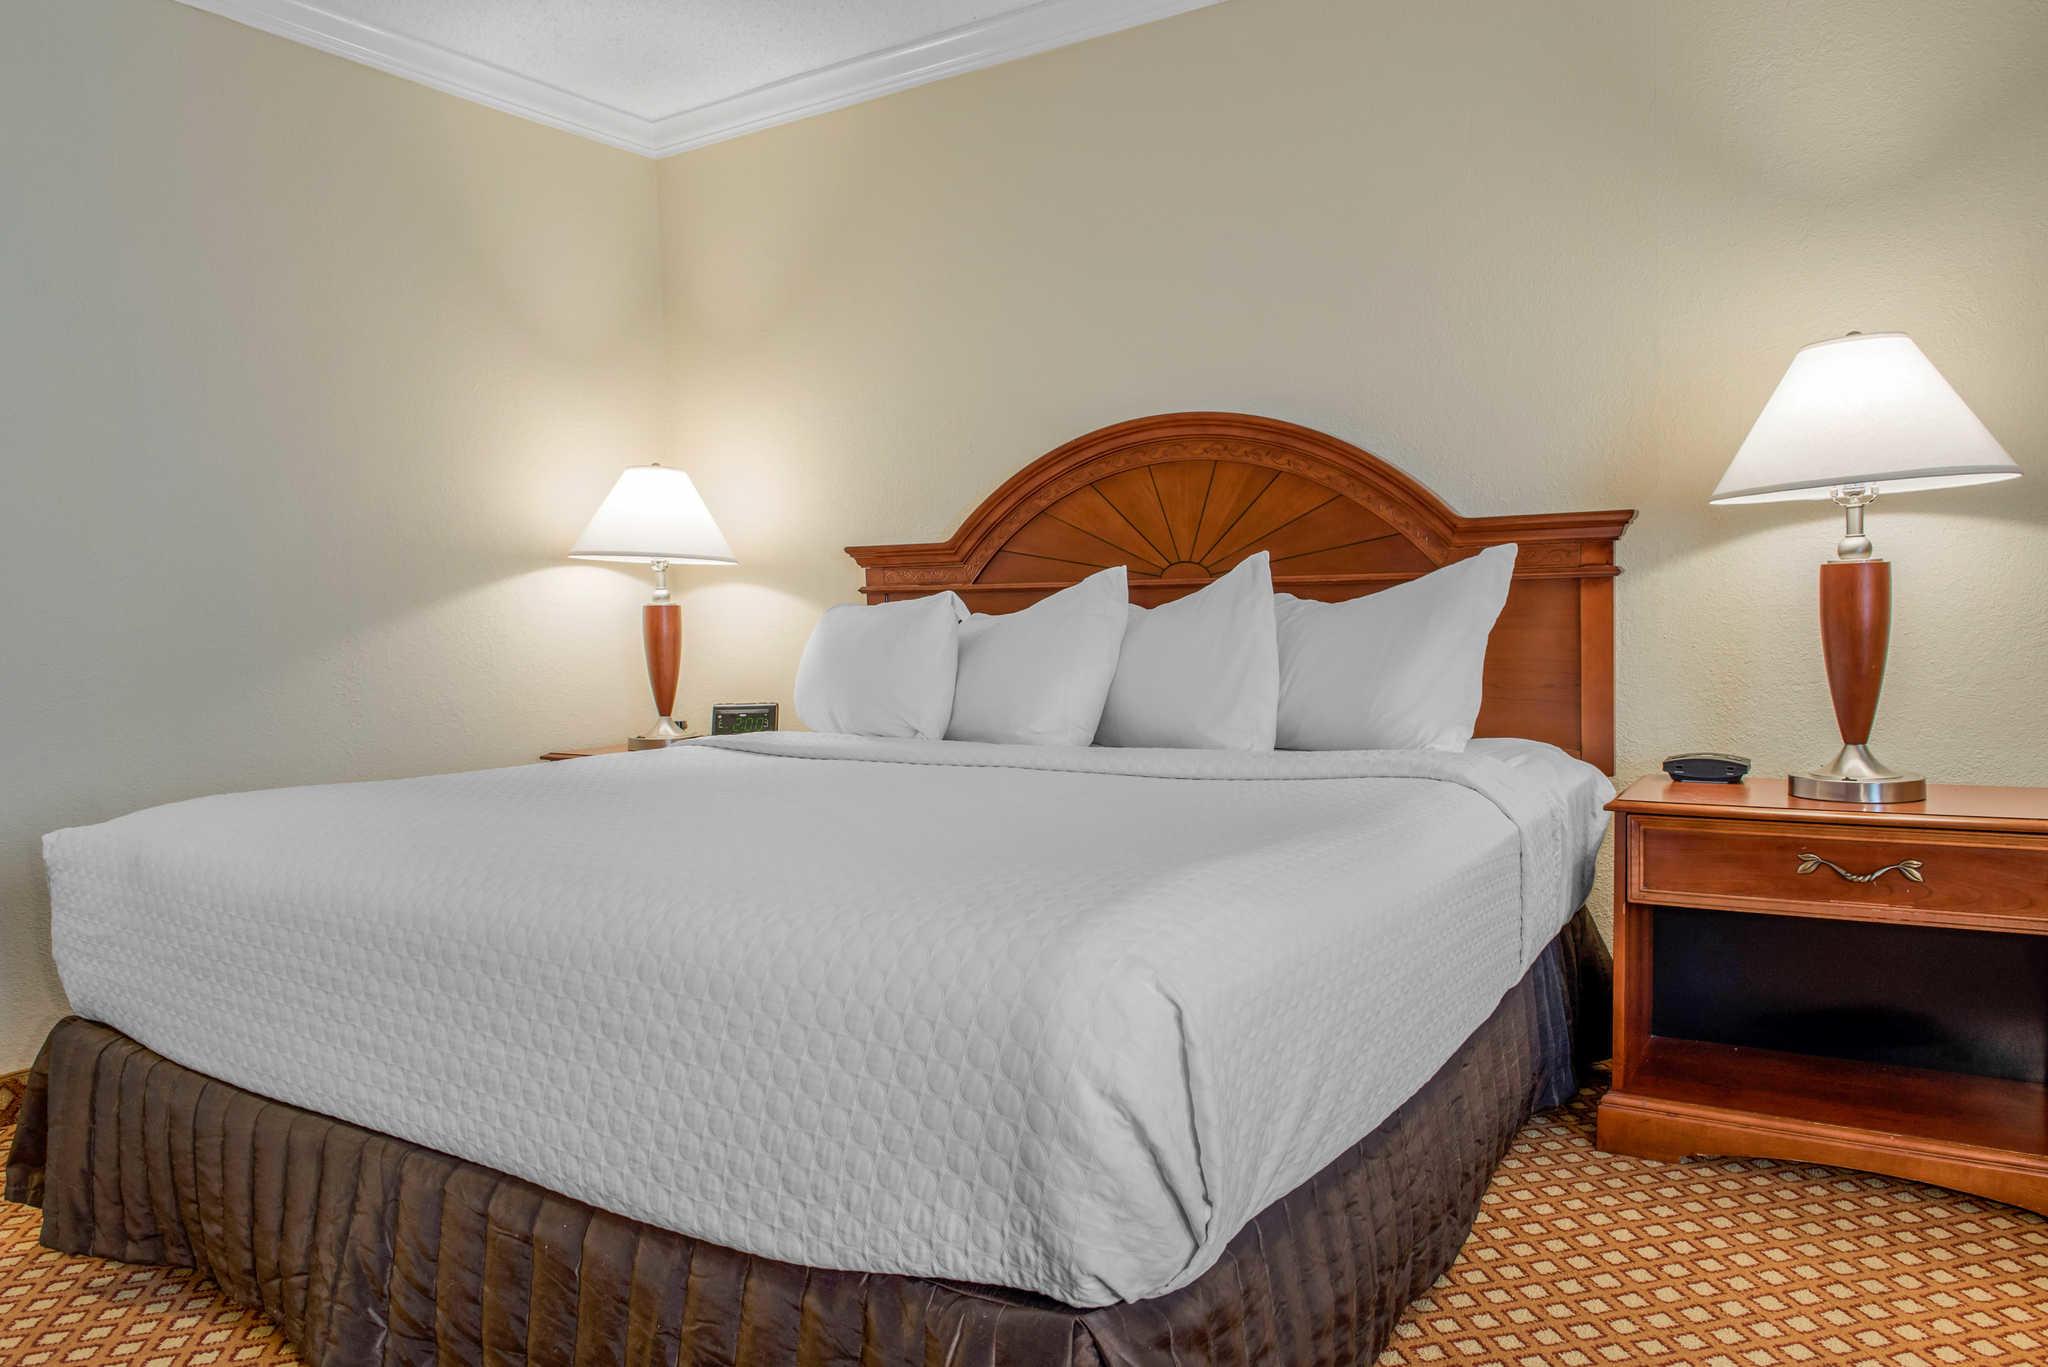 Quality Hotel - Cincinnati Blue Ash image 12